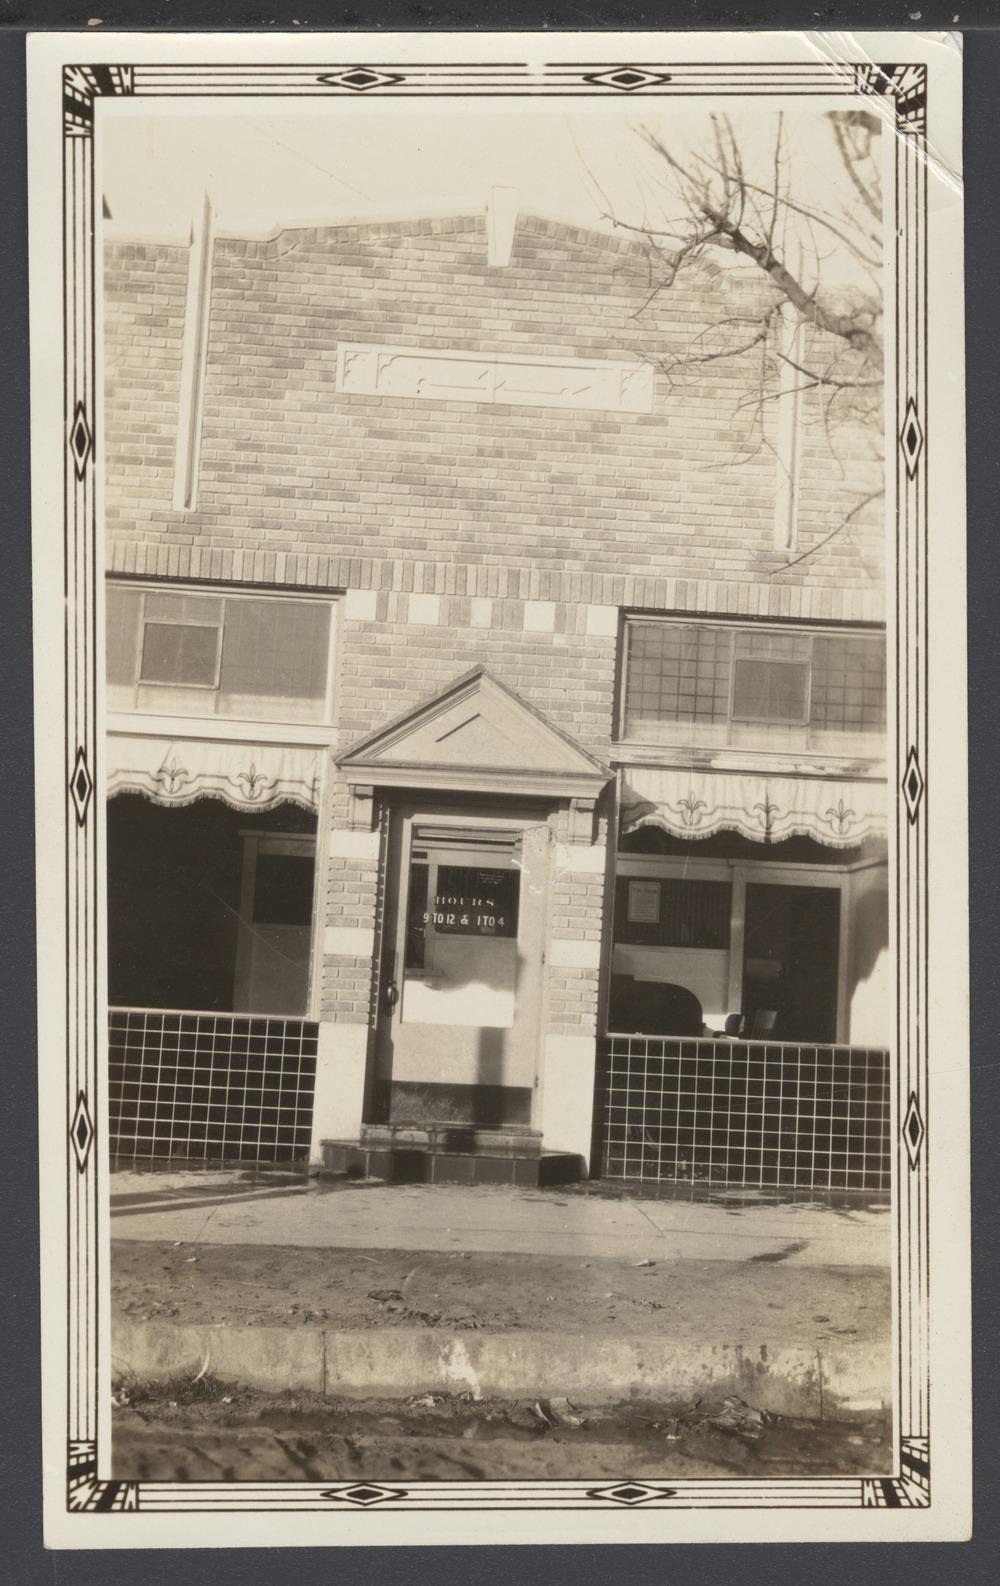 Cimarron State Bank in Cimarron, Kansas - 2